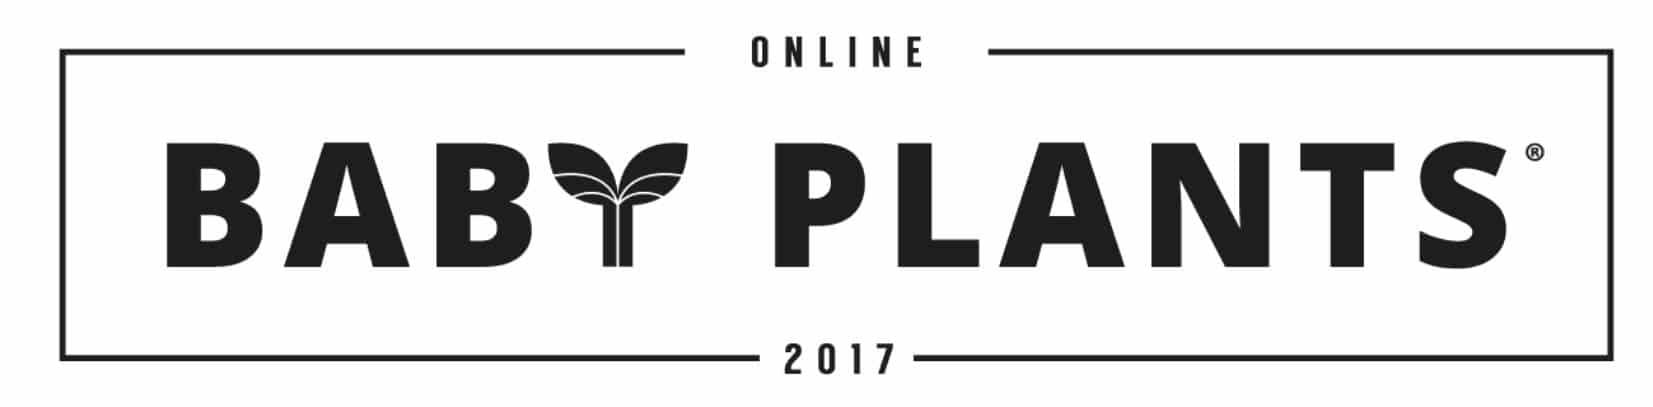 Baby plants Online